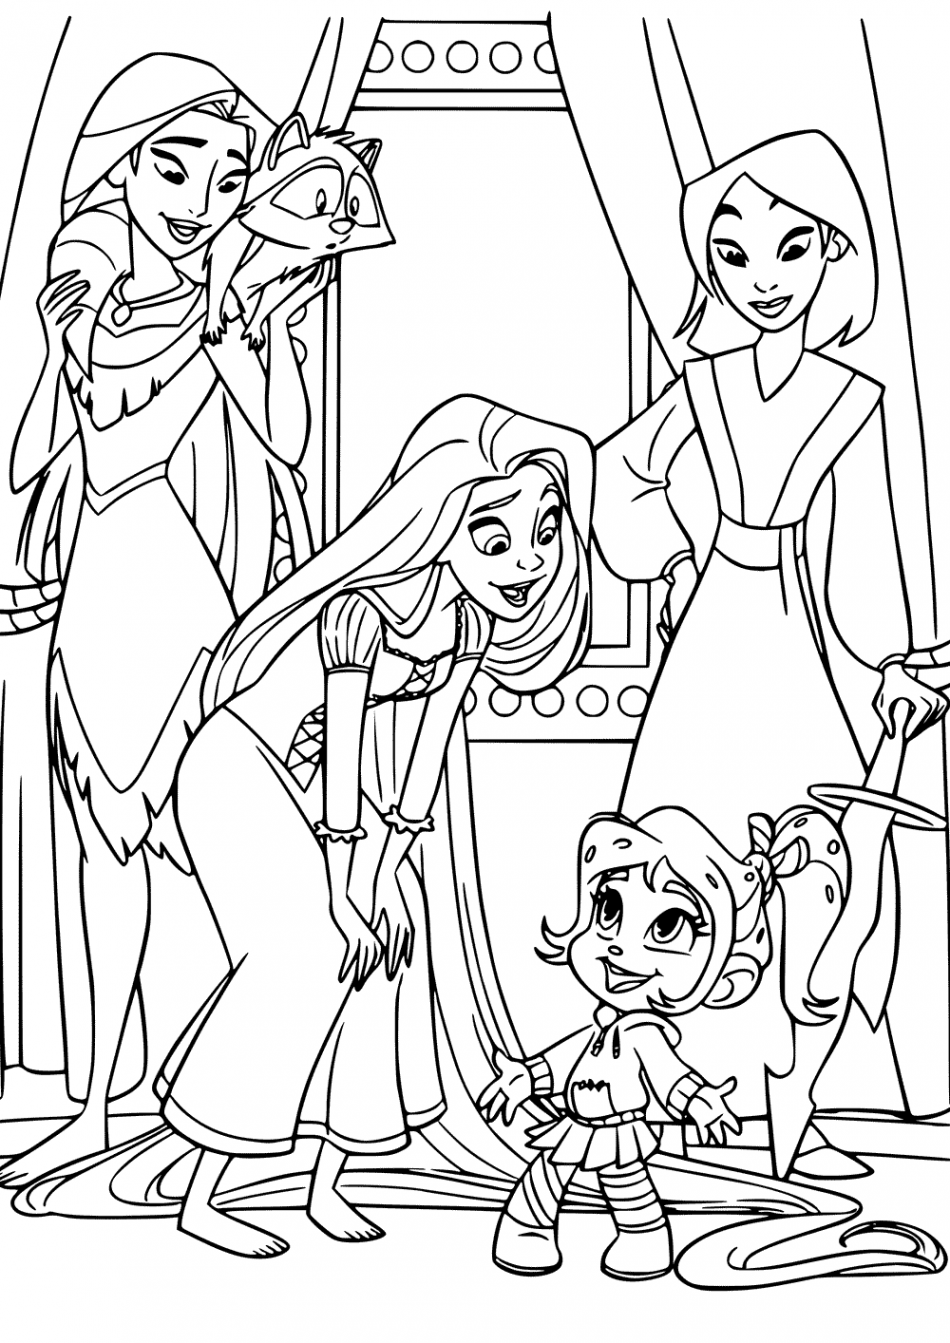 Vanellope and Disney Princess Coloring Pages  Disney princess